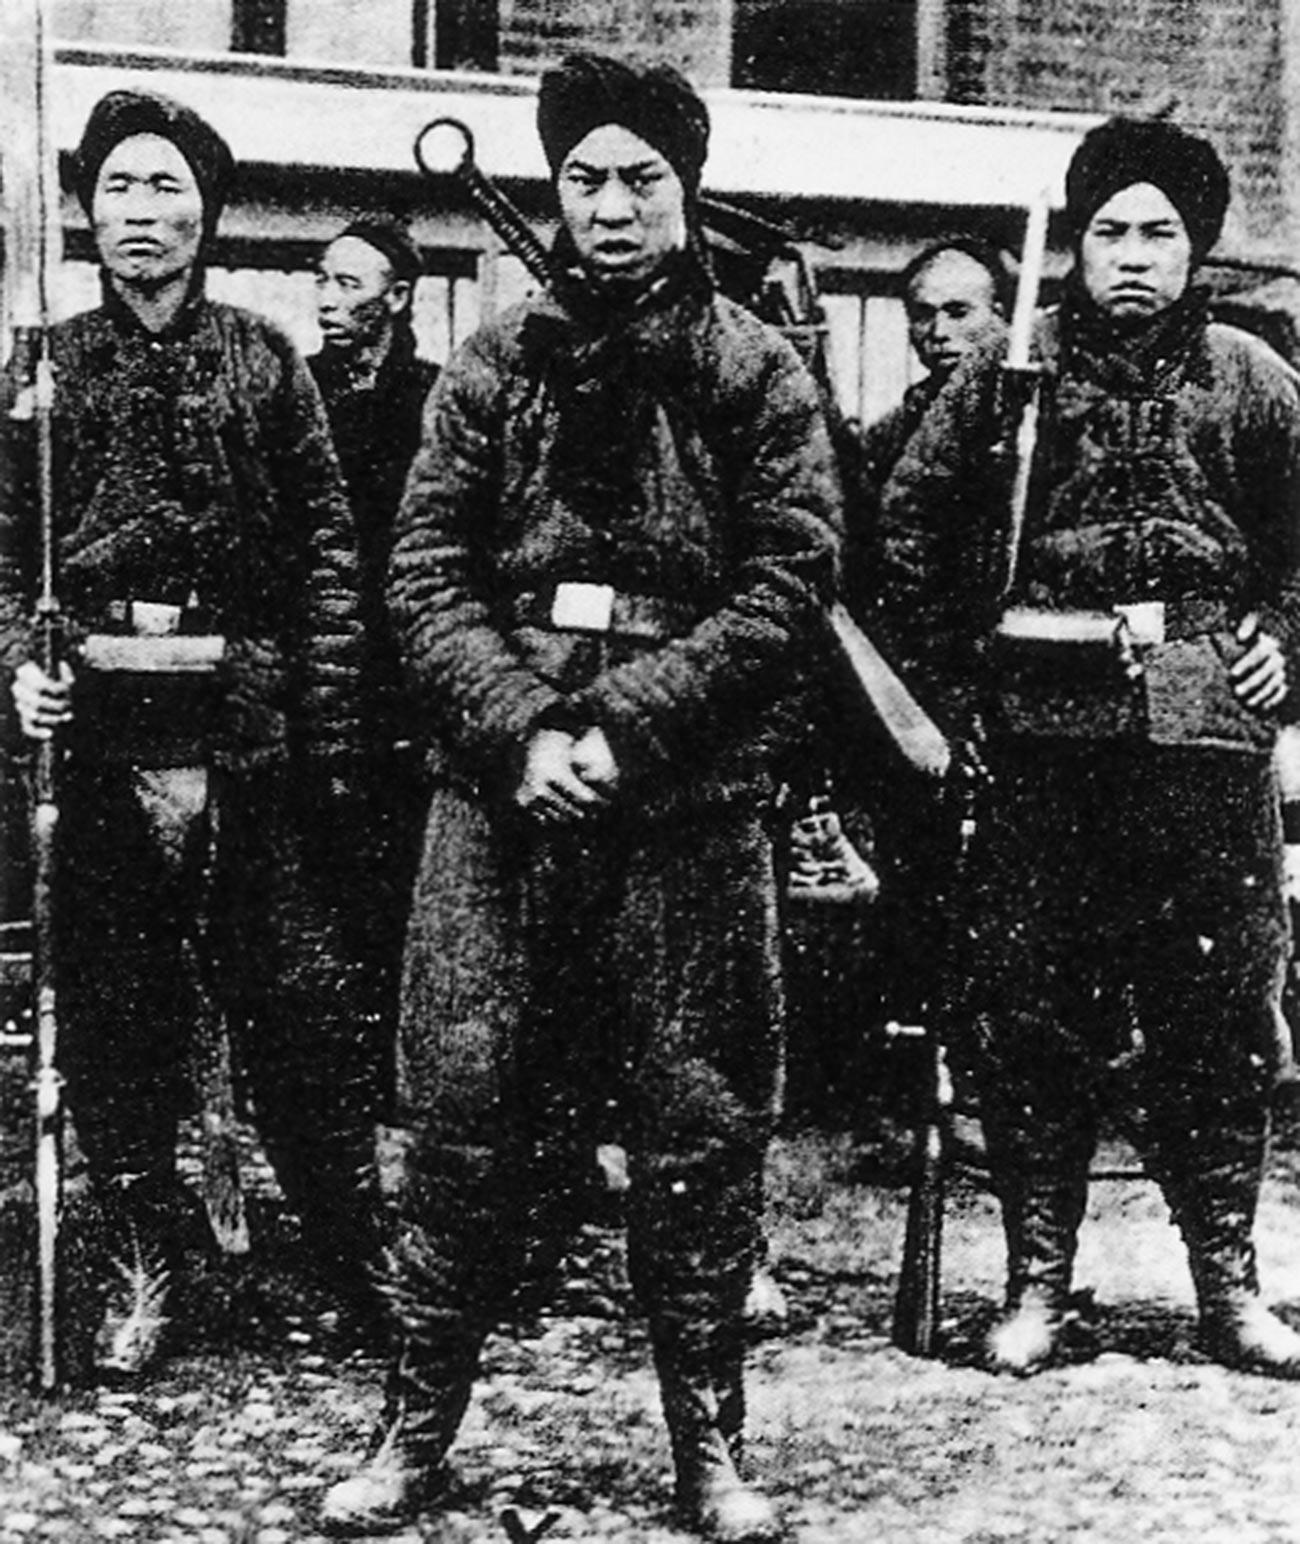 Gli Yihetuan, i gruppi di autodifesa dei villaggi